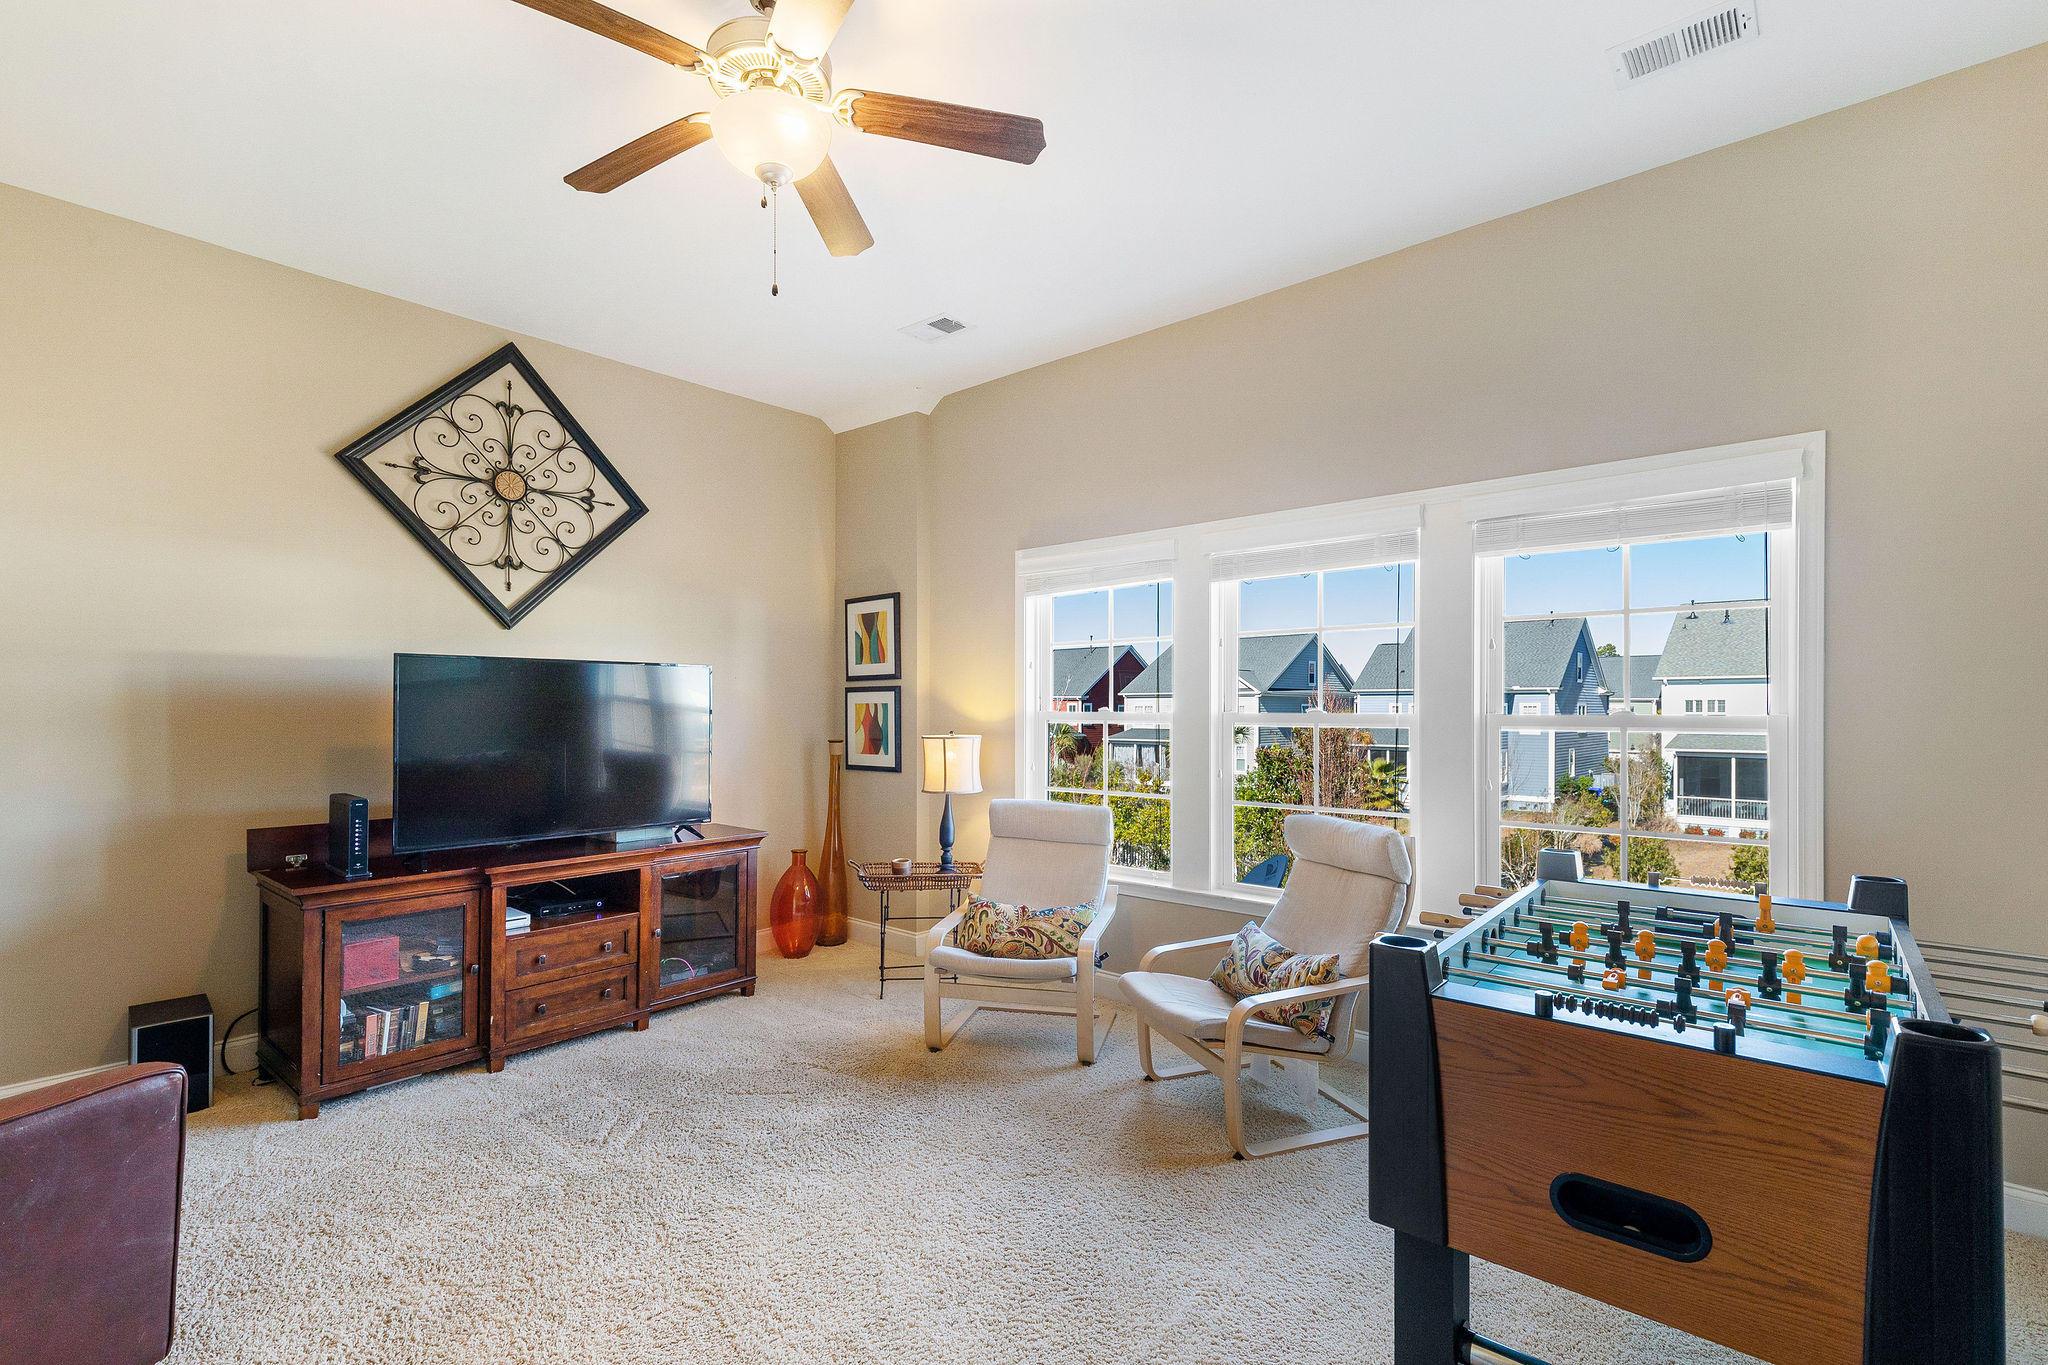 Dunes West Homes For Sale - 3212 Hatchway, Mount Pleasant, SC - 4